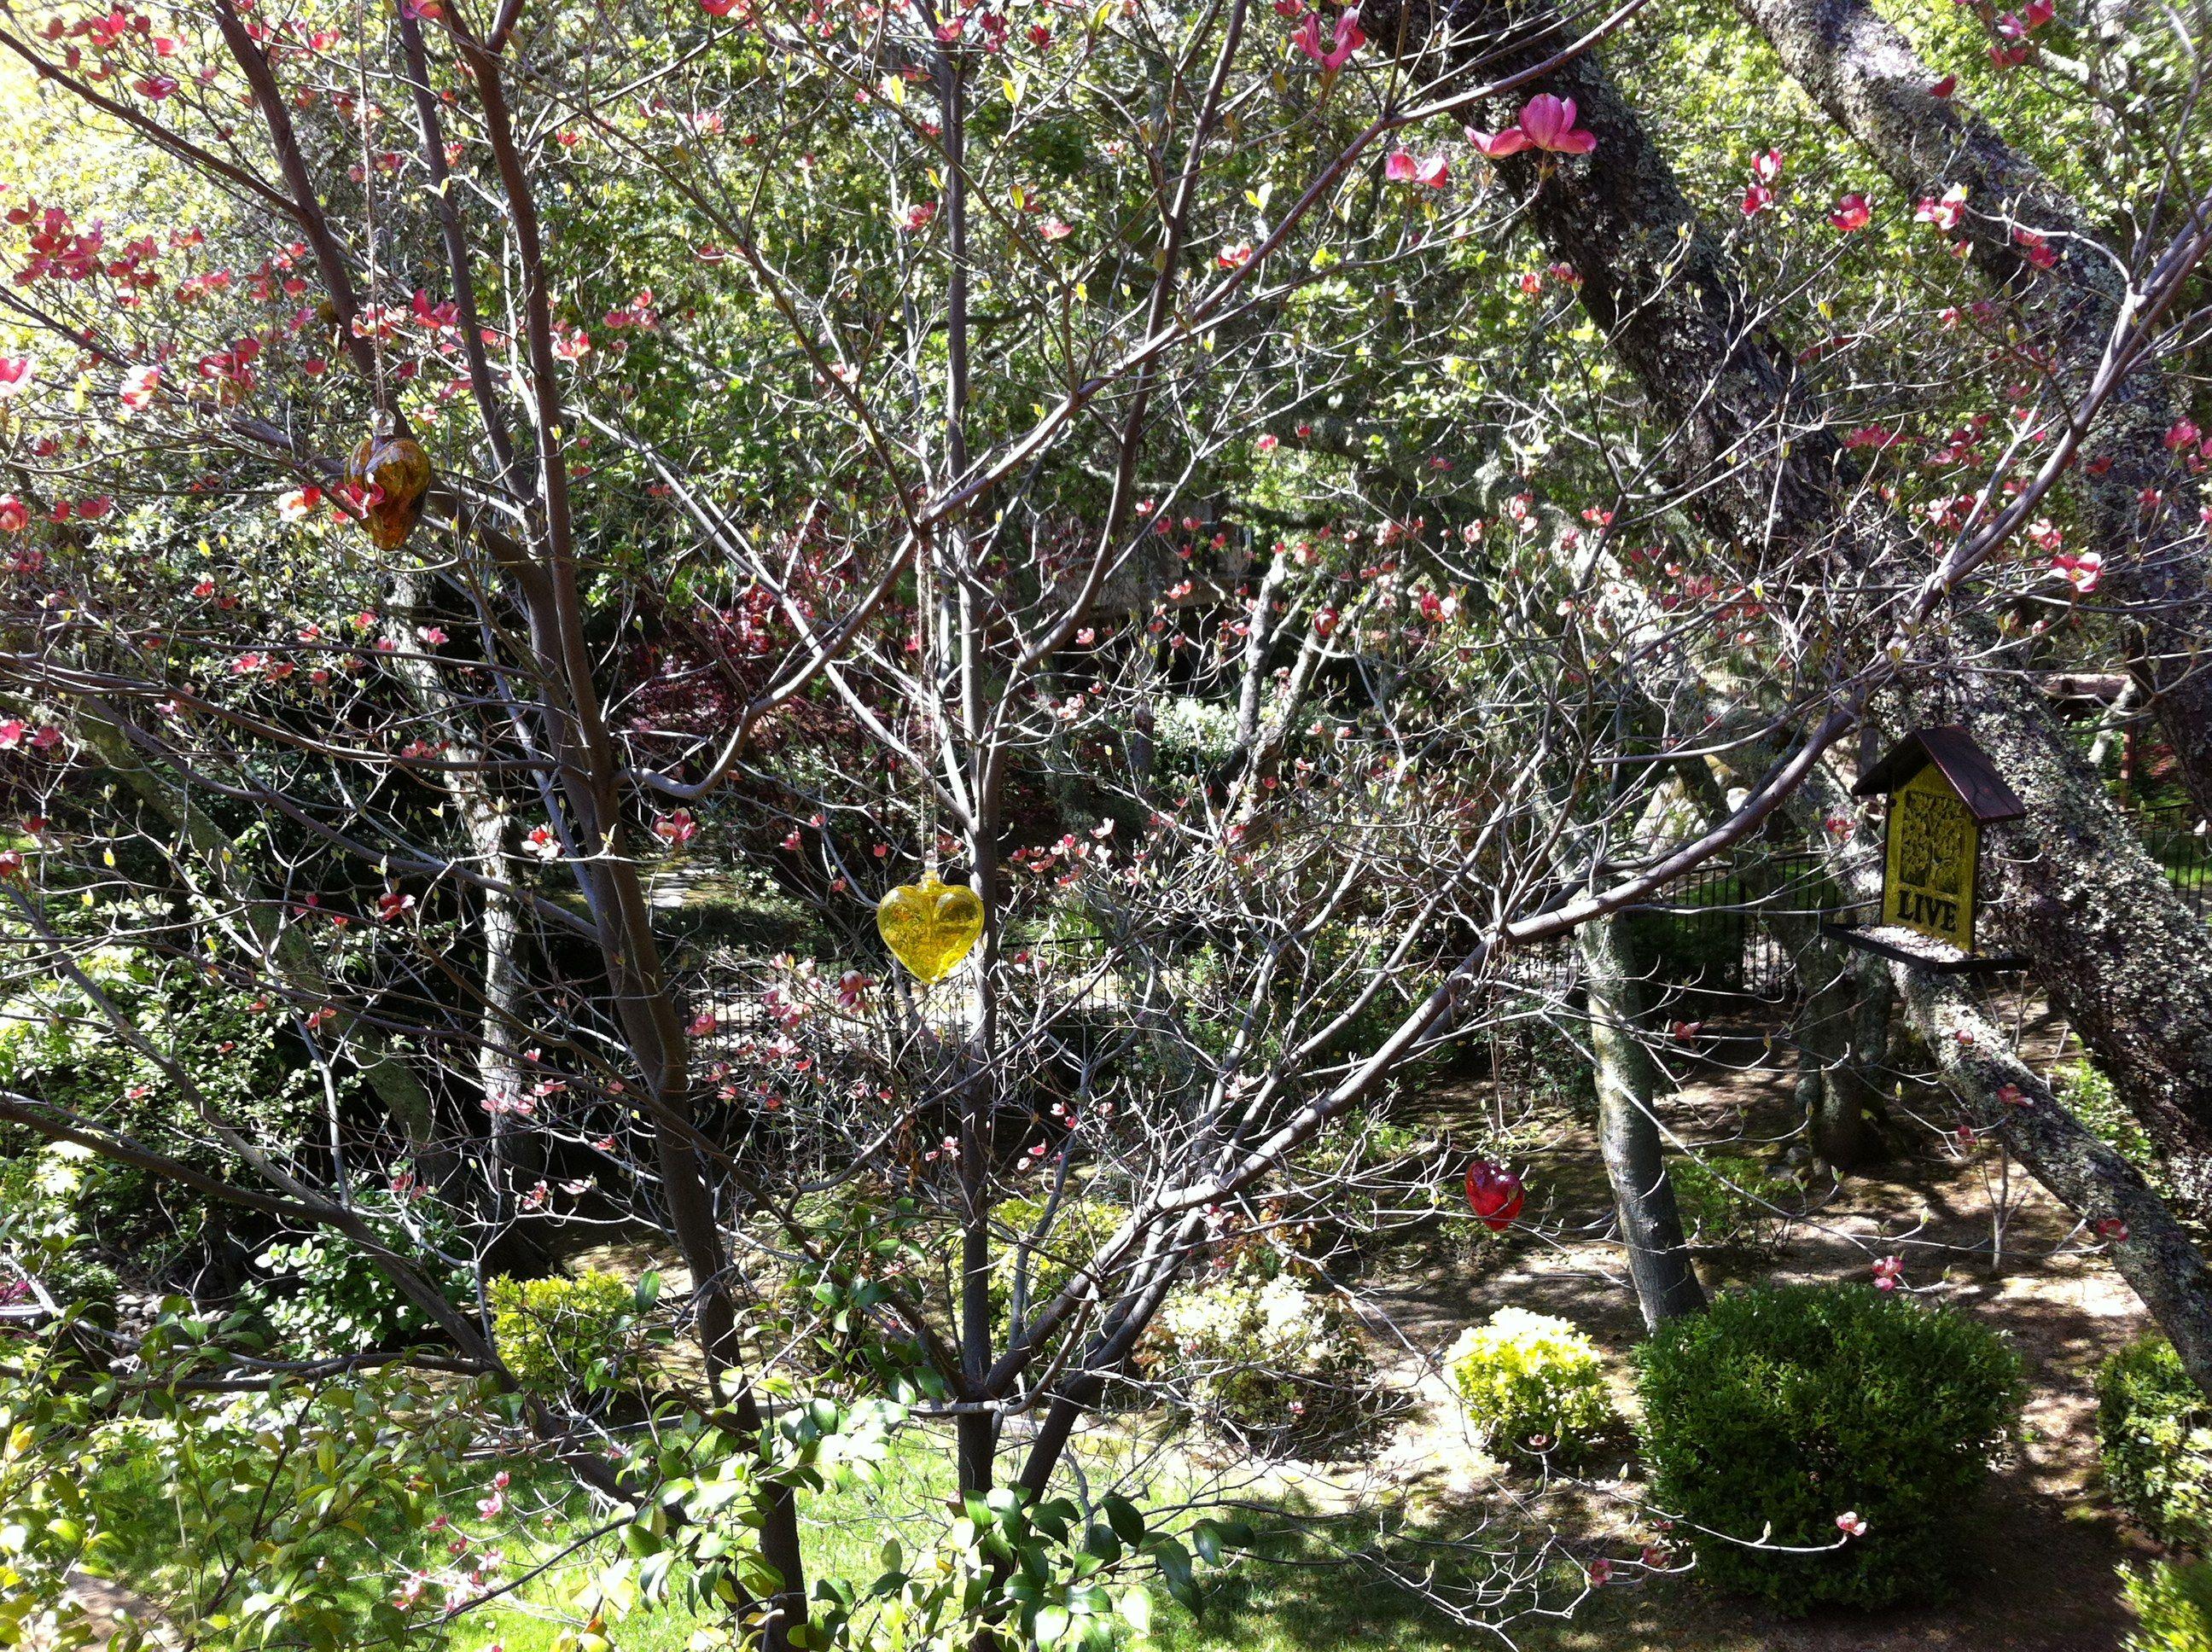 Photo on 2012-04-15 at 12:04.jpg